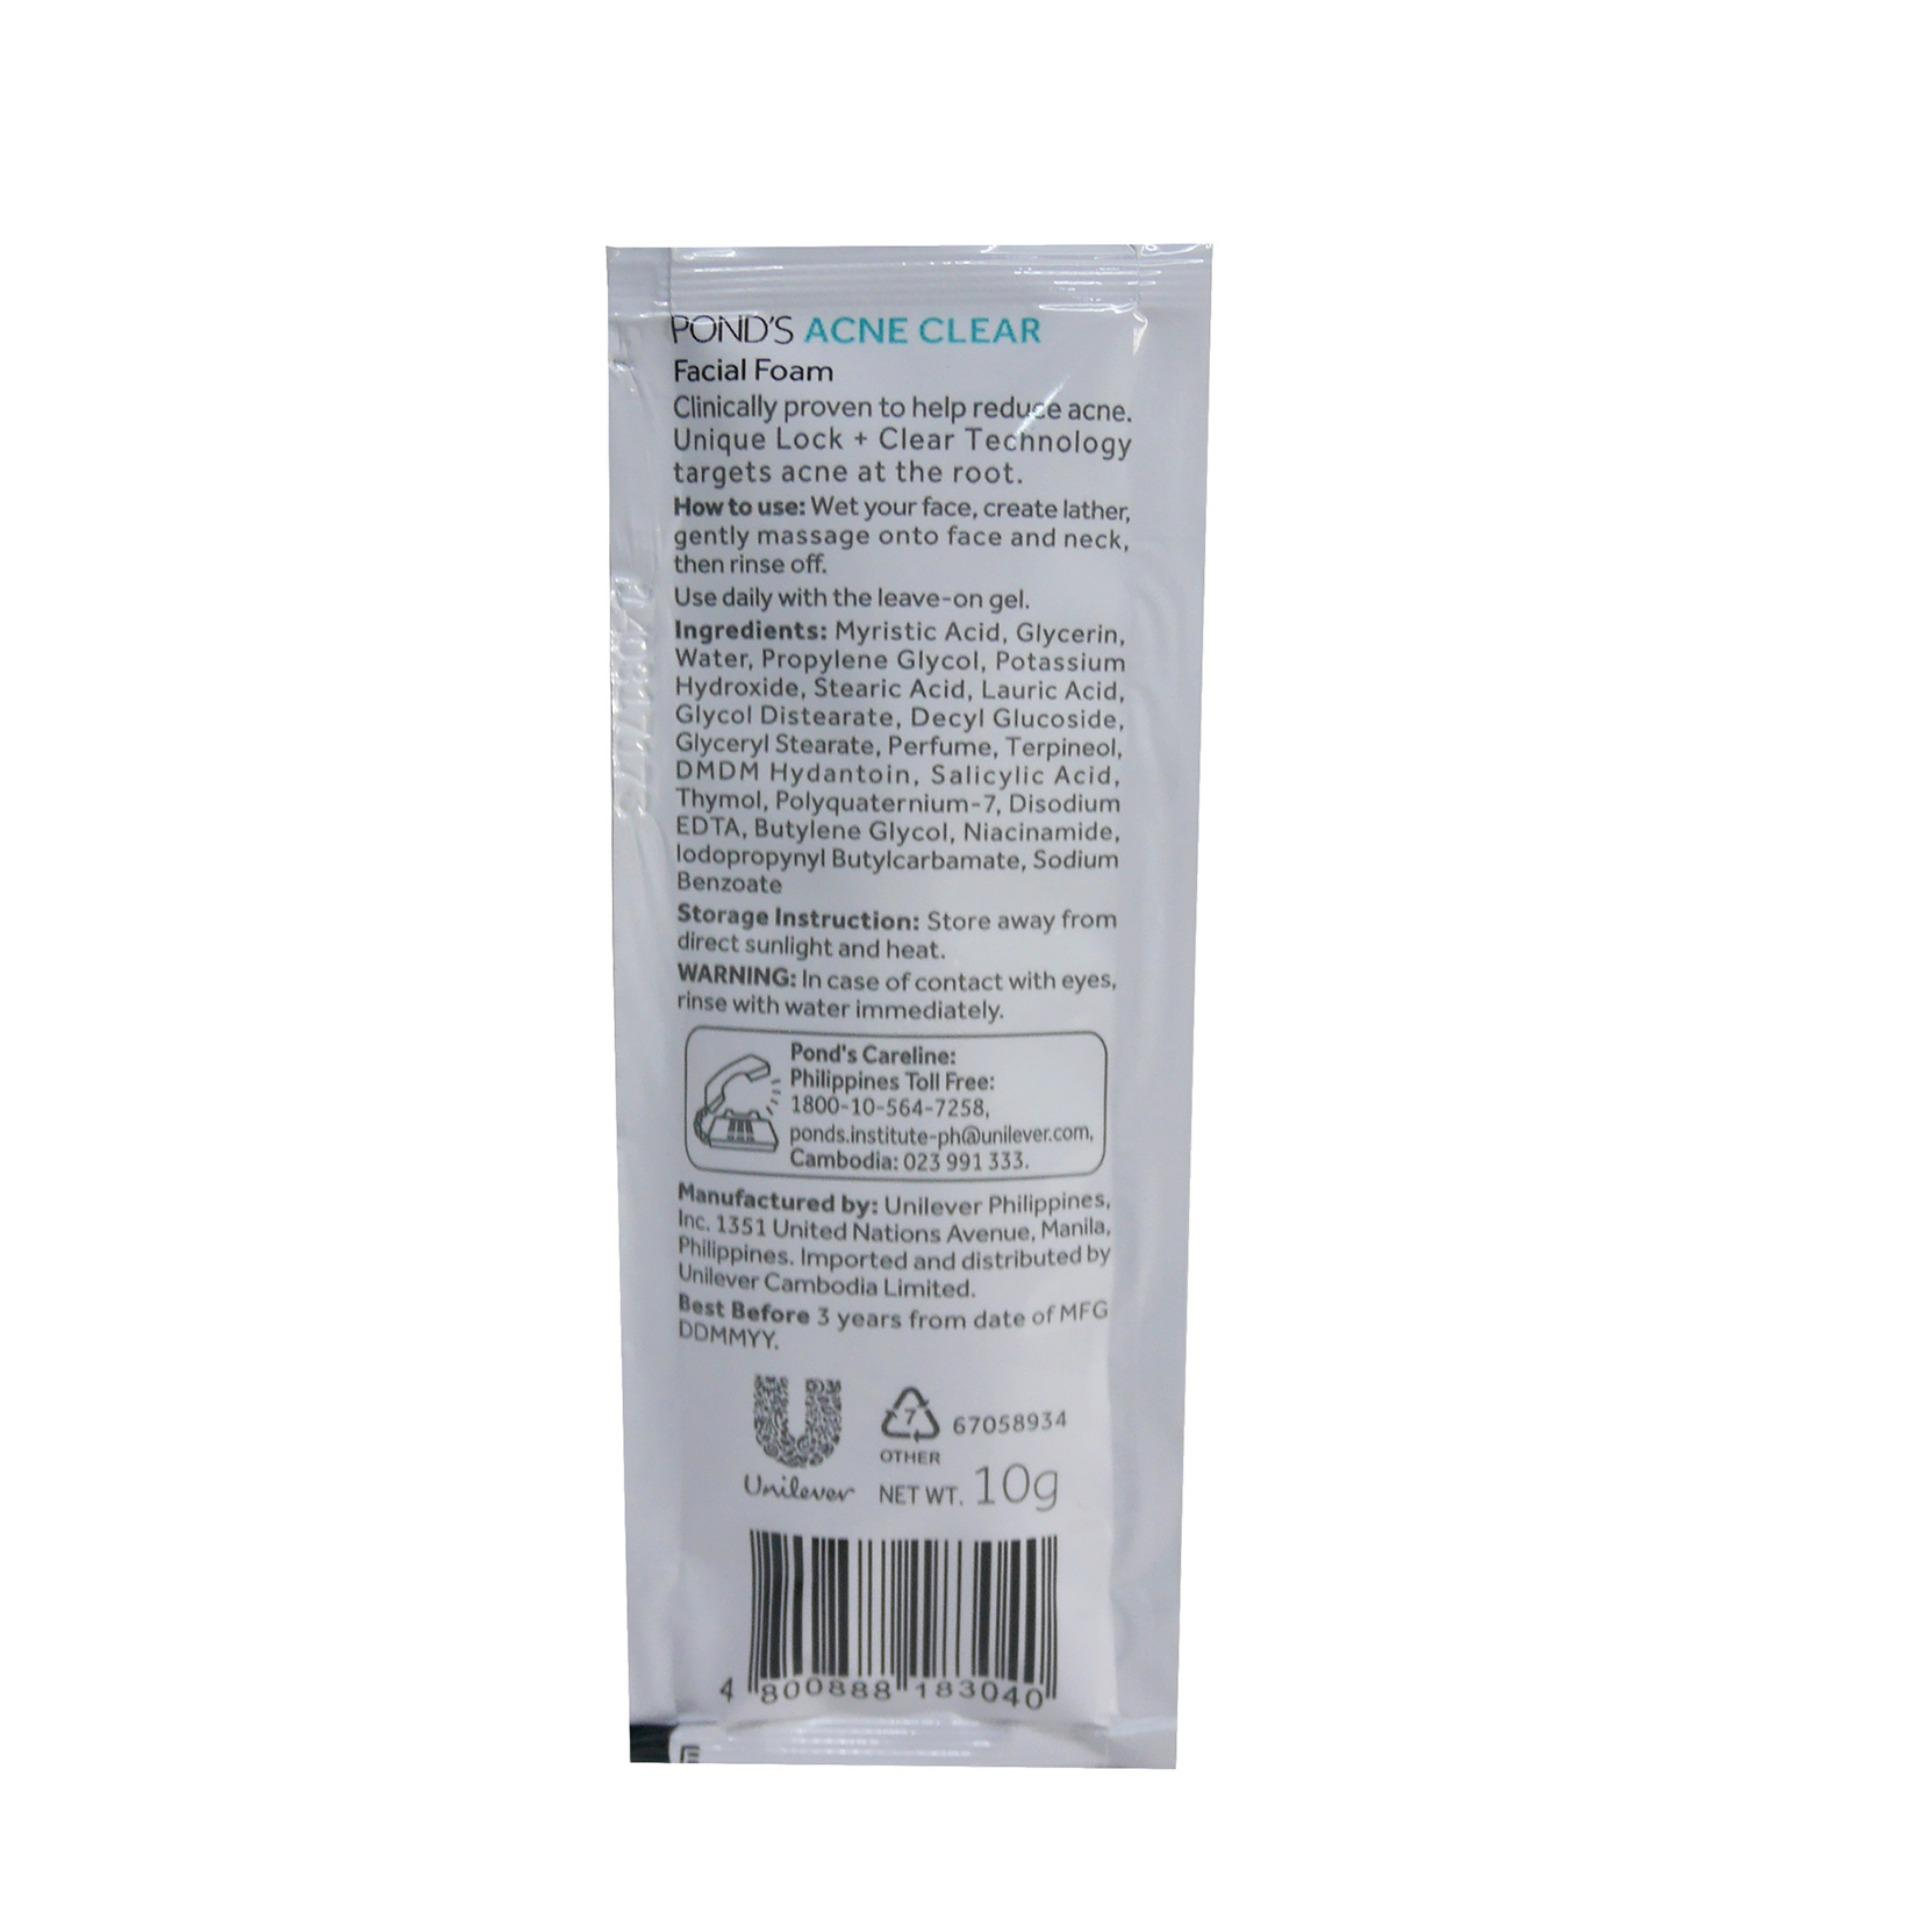 Philippines Ponds Facial Foam Acne Clear 10g 183040 12s 1 Box Men Solution Gel 20 Gr